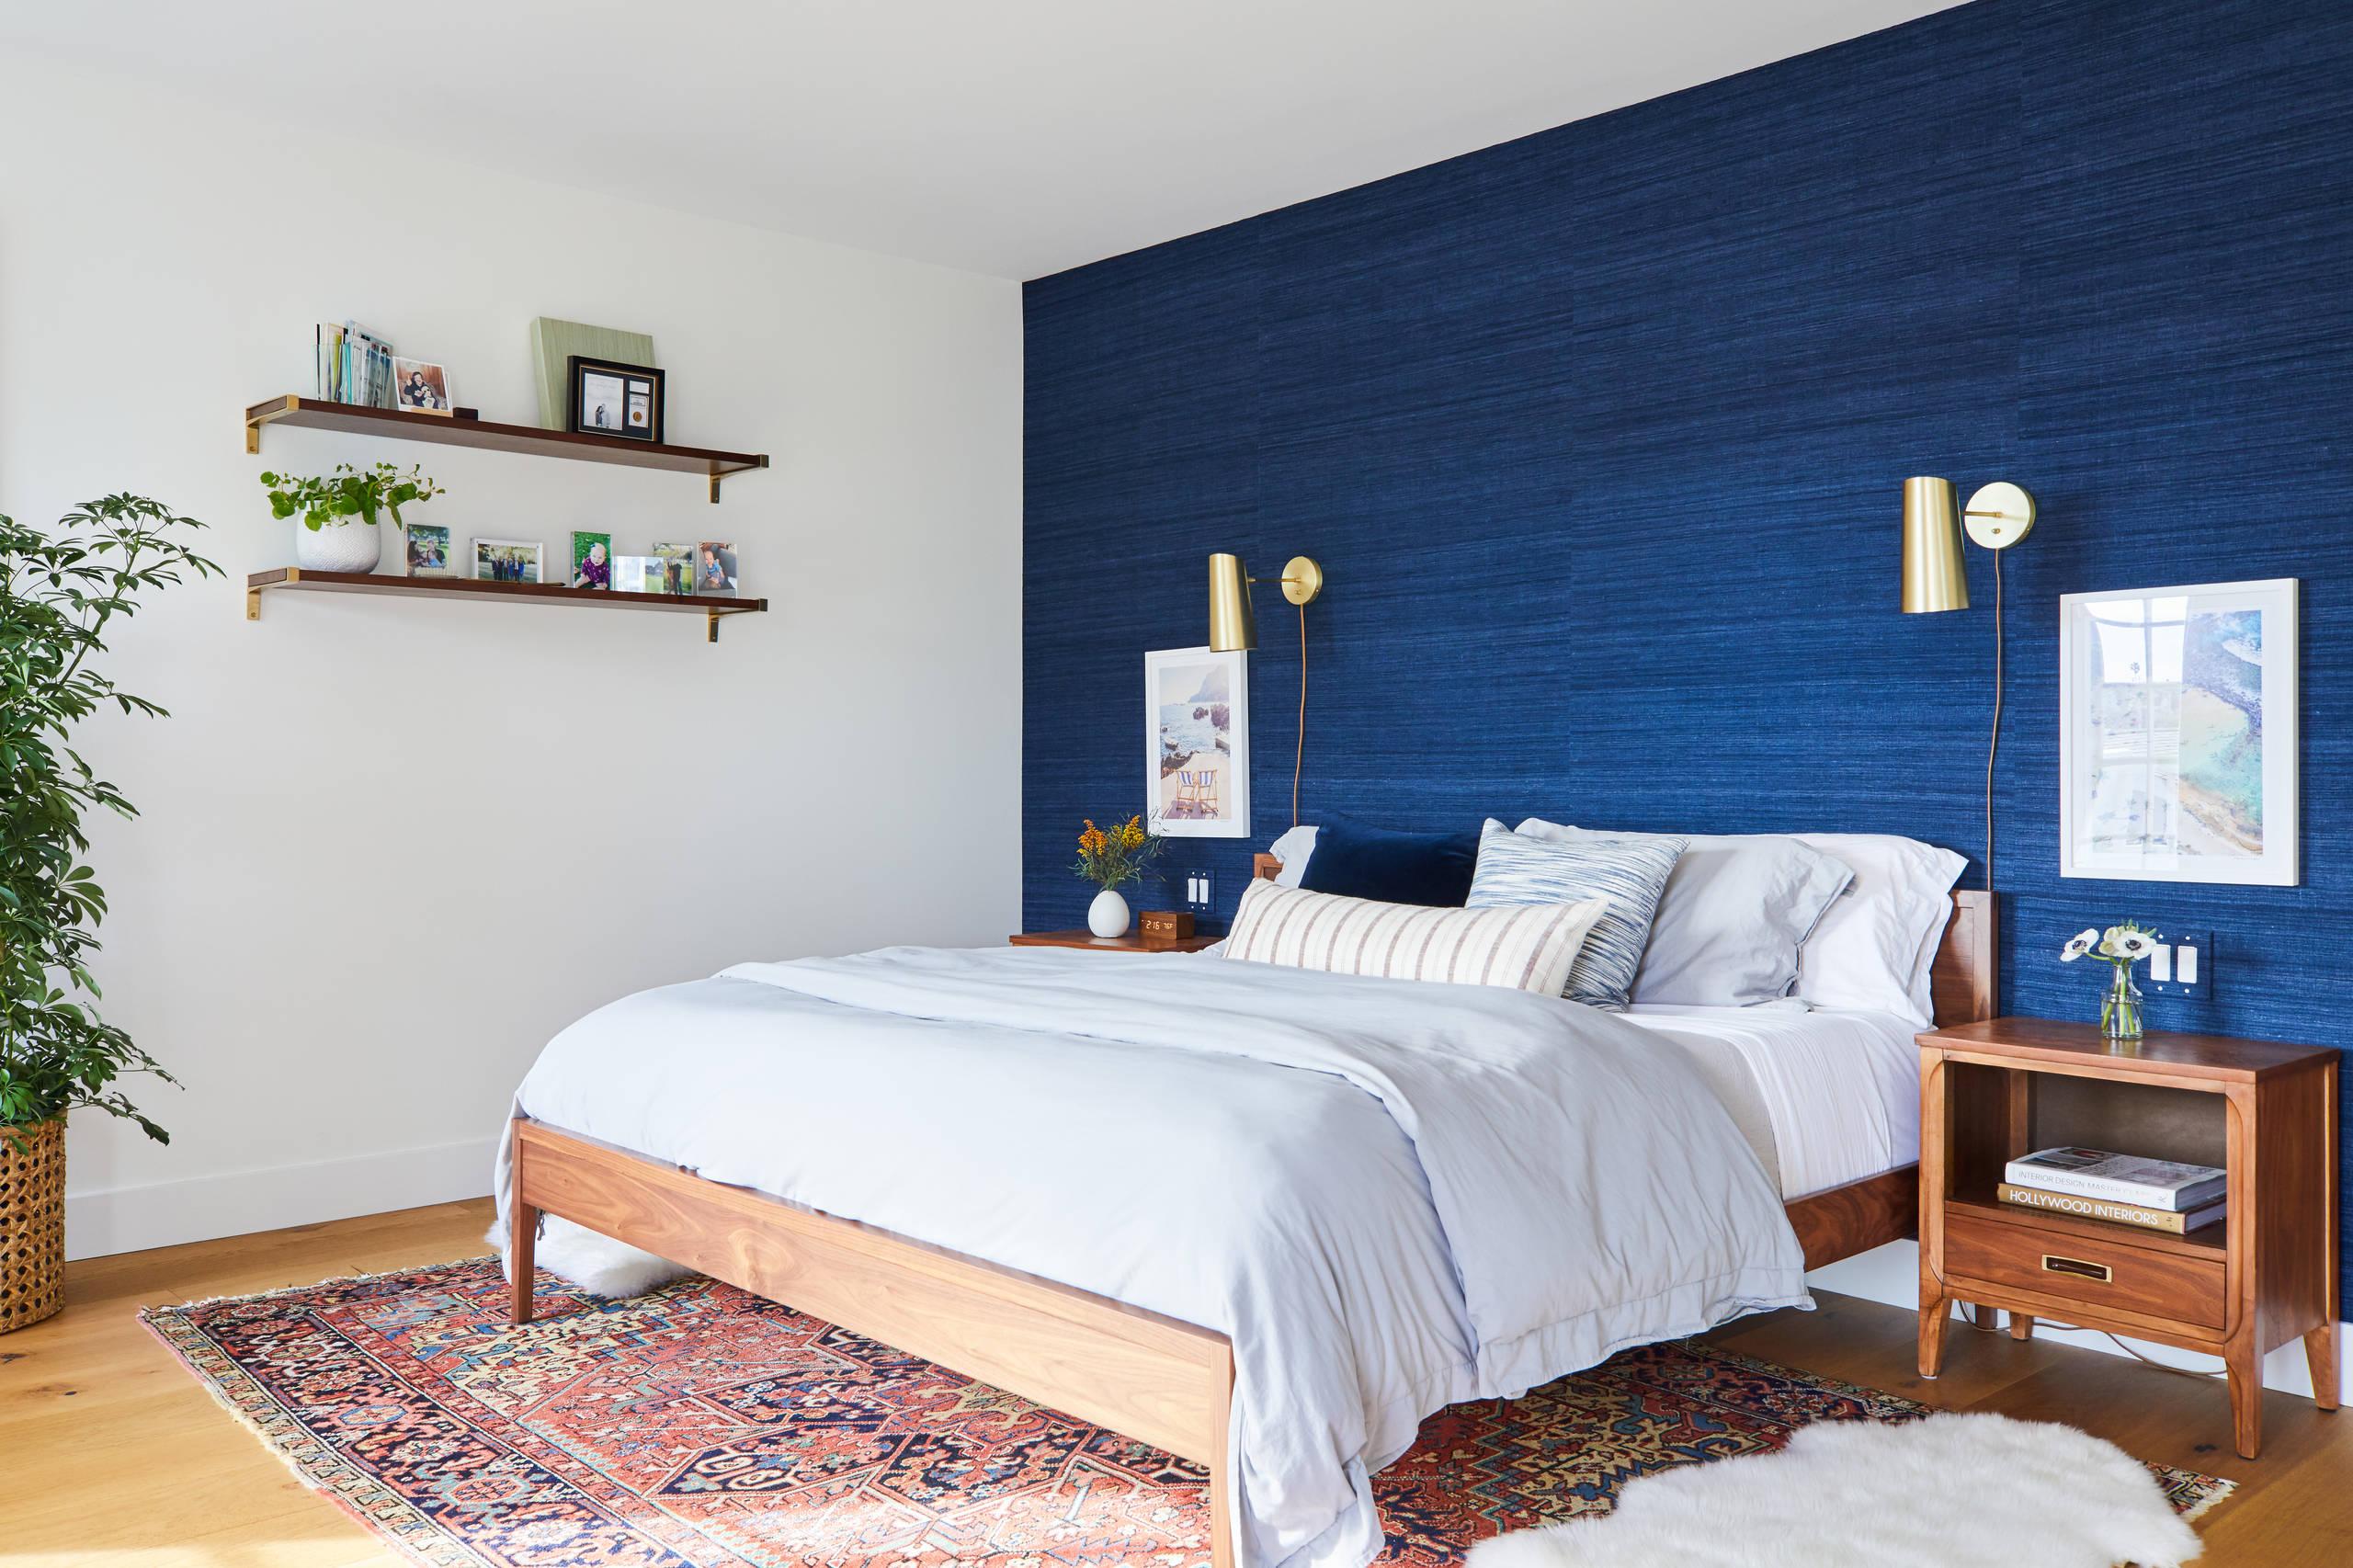 999 Beautiful Blue Bedroom Pictures Ideas October 2020 Houzz